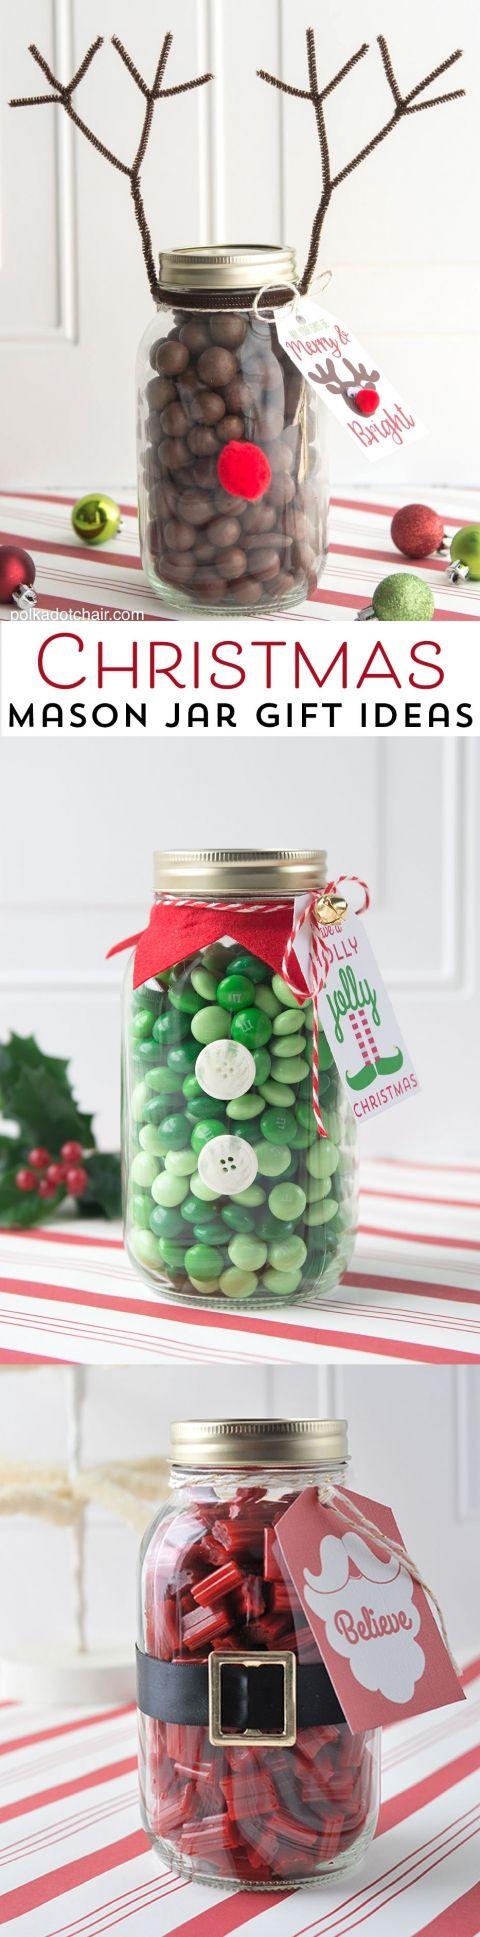 Reindeer Mason Jar Christmas Gift idea, so cute and easy. Would make a fun neighbor or teacher gift!